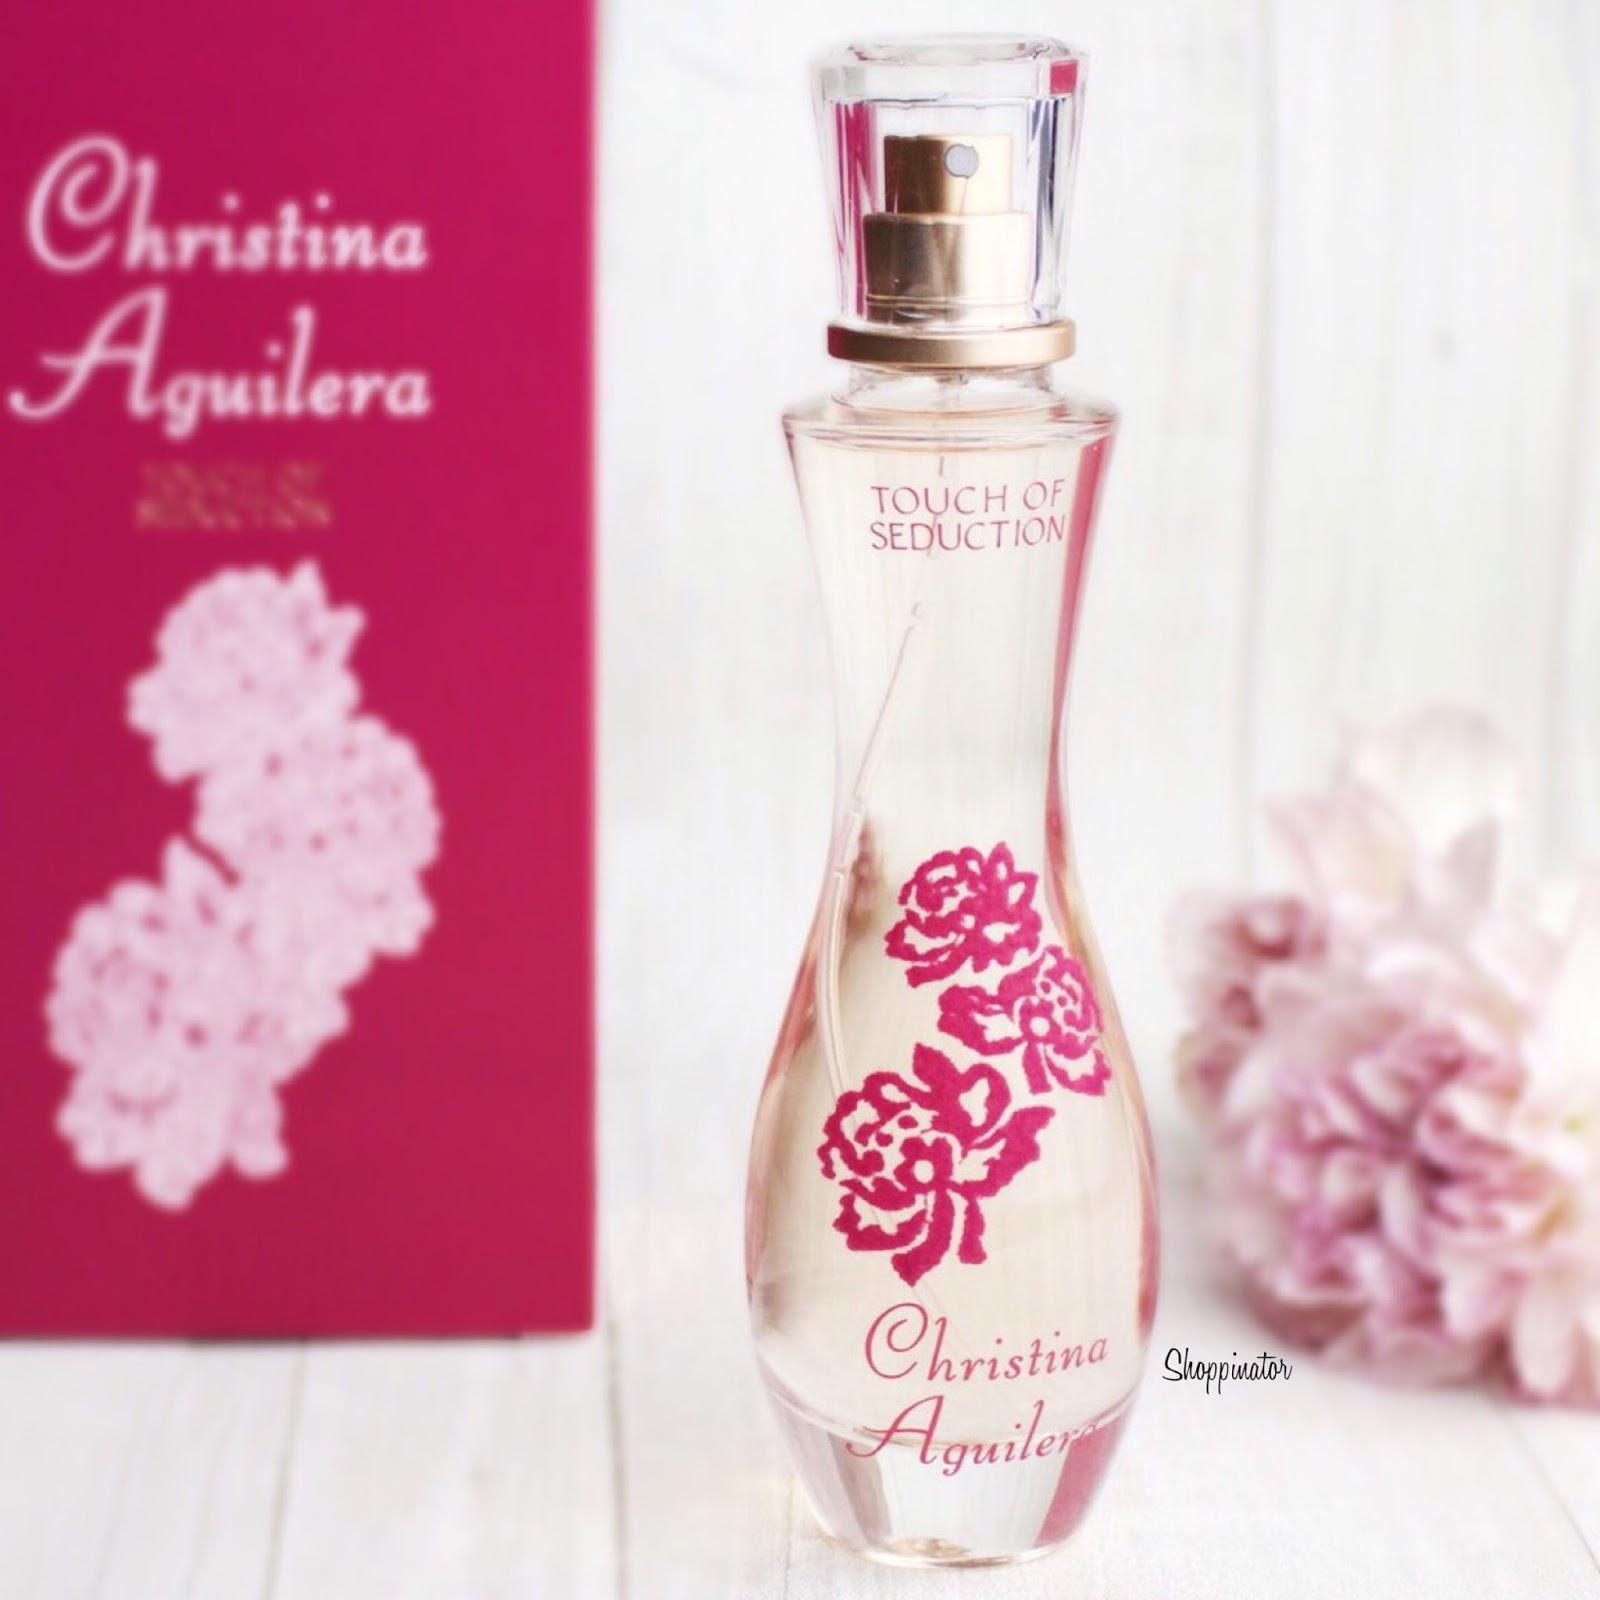 Duftvorstellung – Christina Aguilera – 'Touch of Seduction' EdP